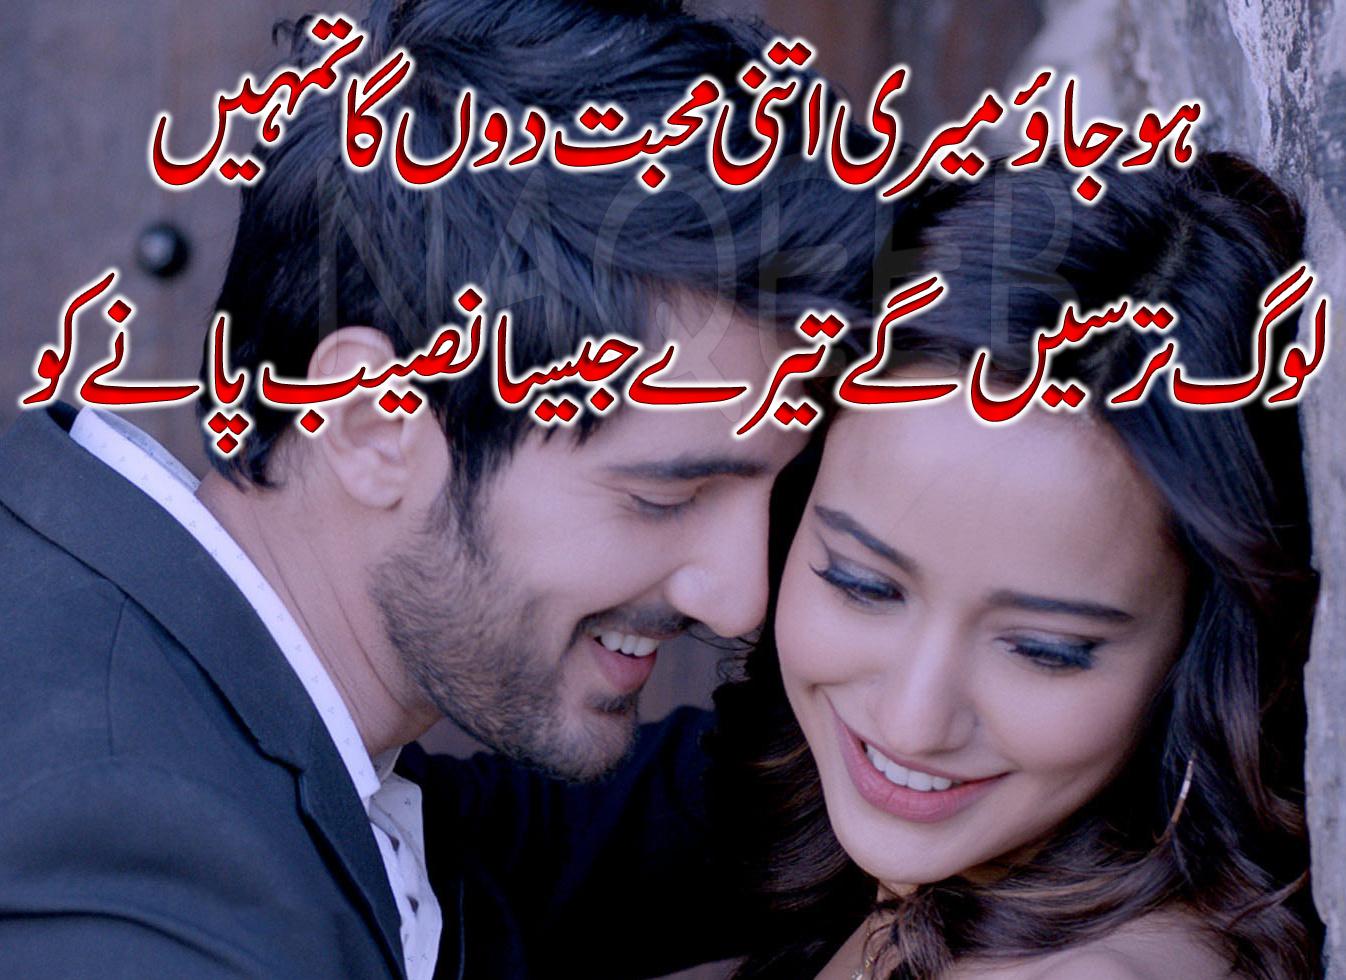 Romantic Urdu Poetry for Husband & Wife